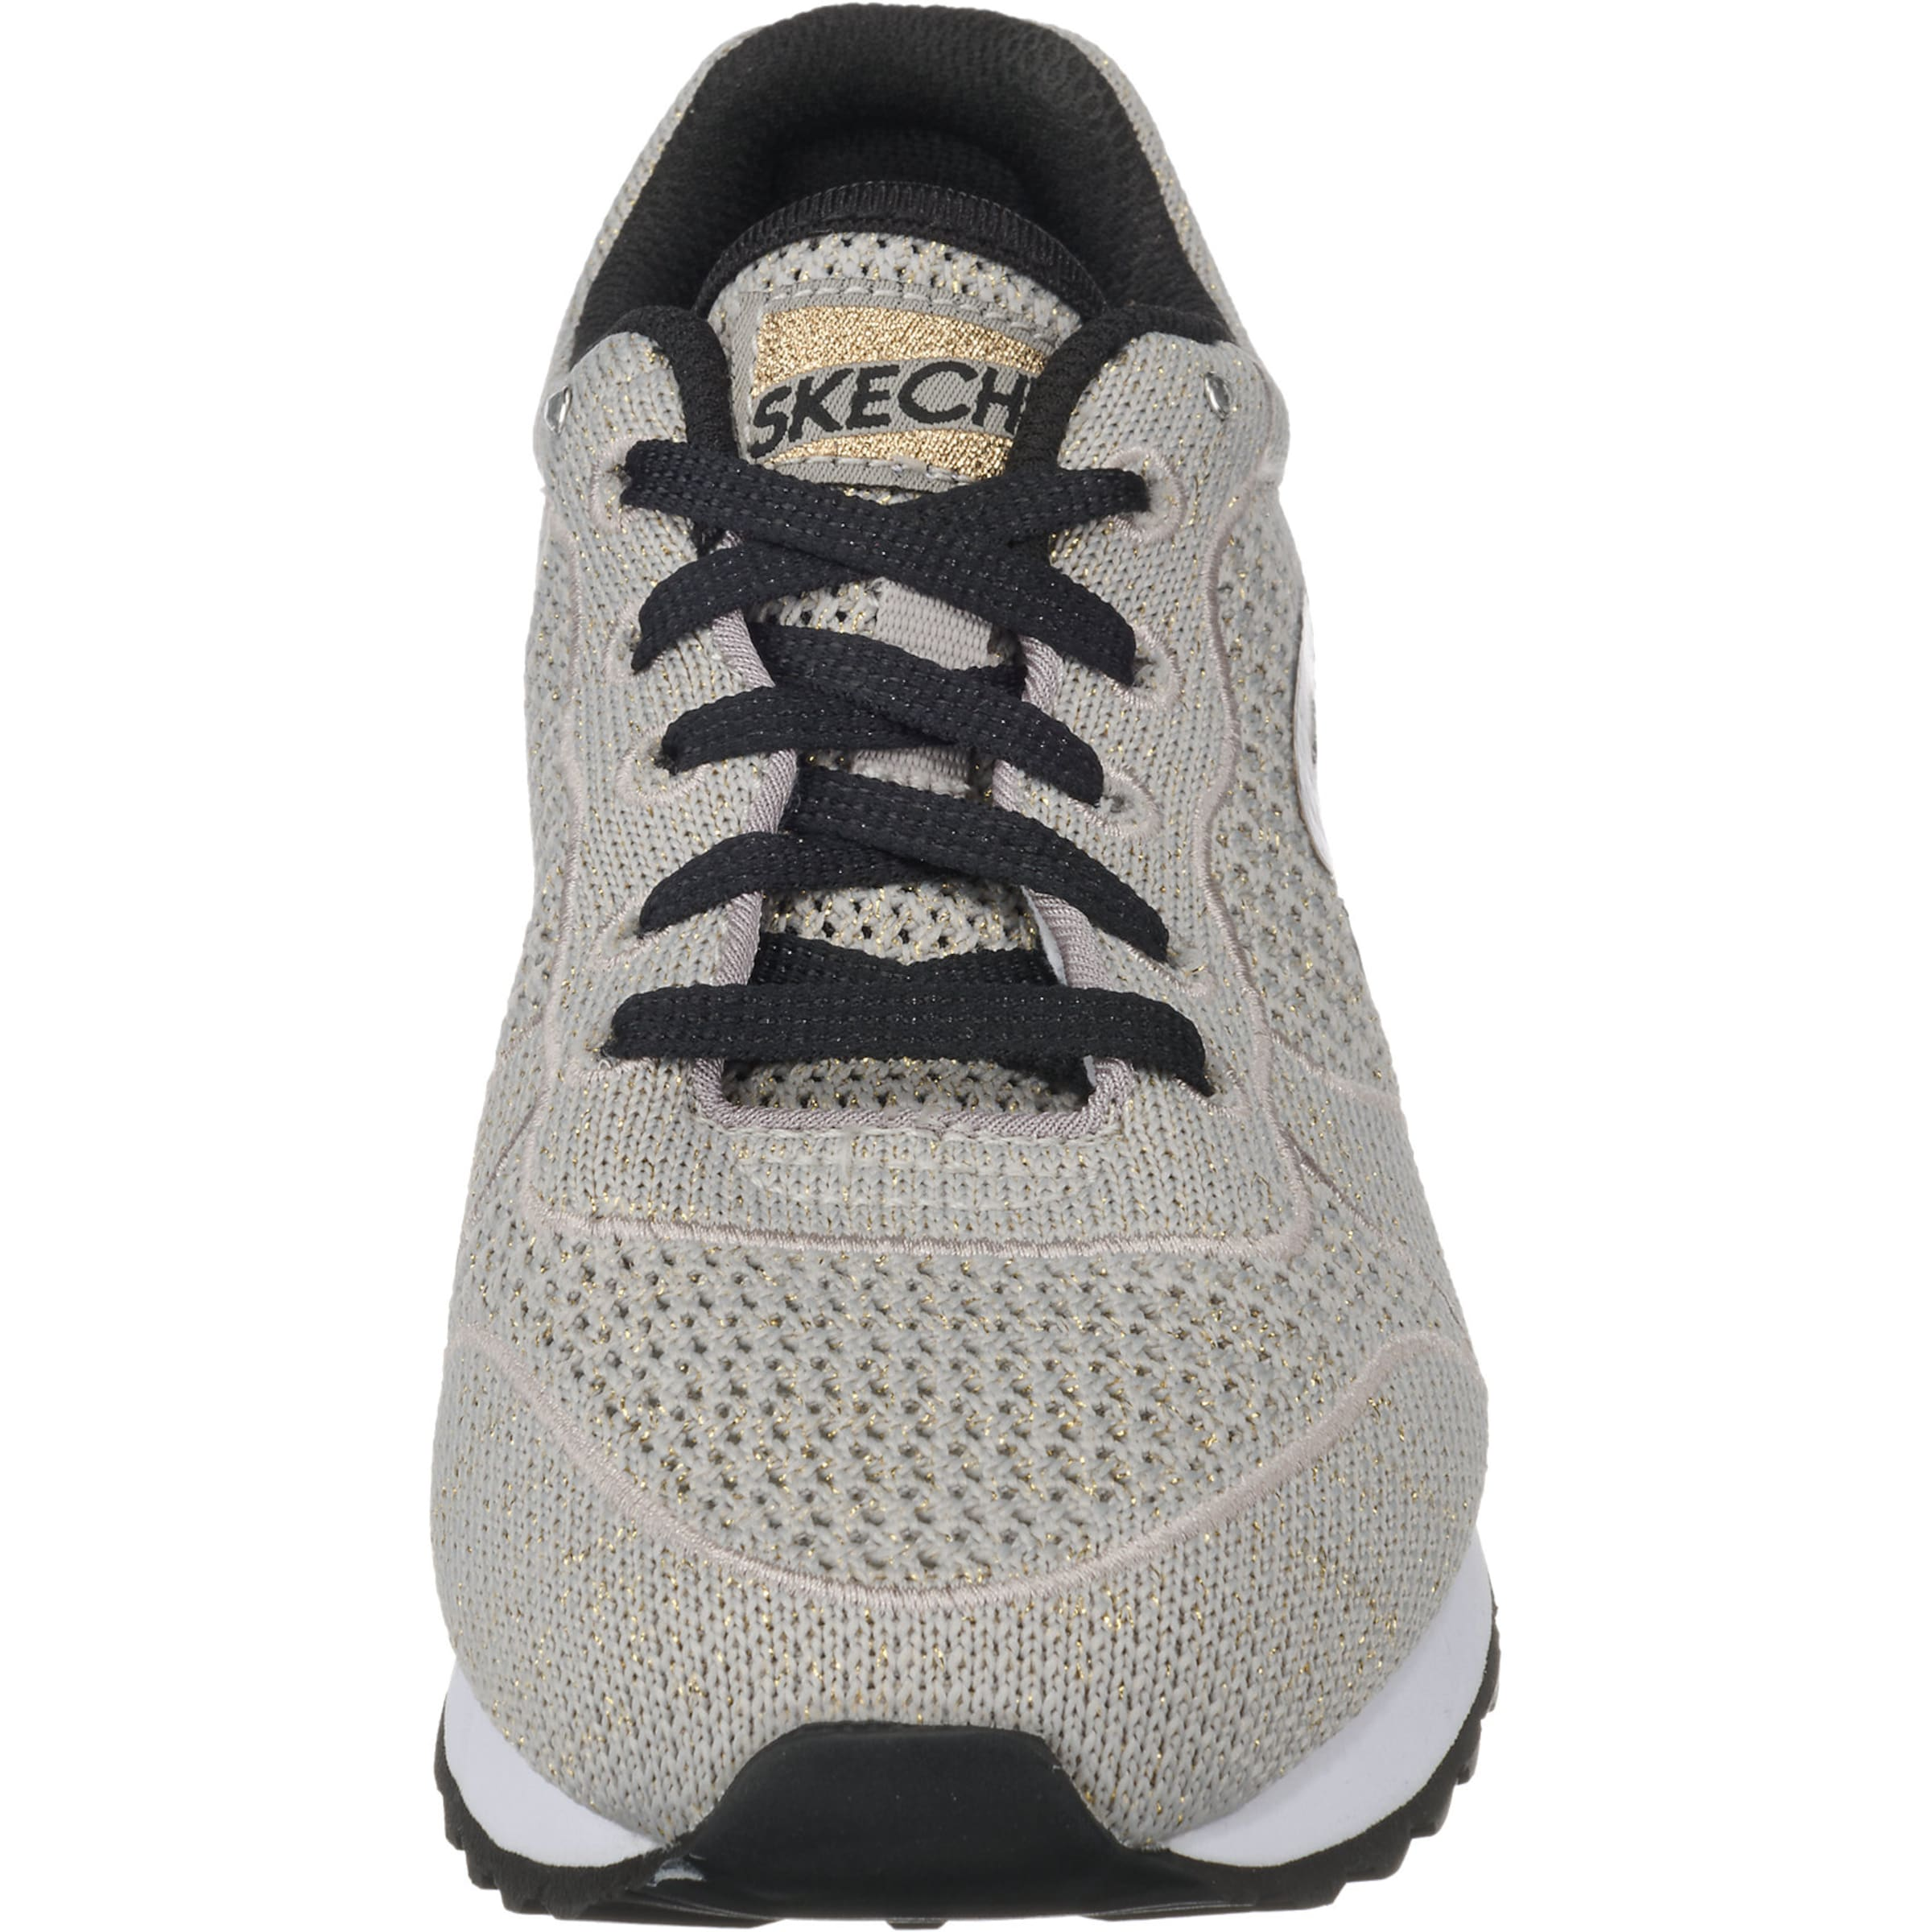 SKECHERS 'OG 85 Low Flyers' Sneakers Low Countdown Paket Günstiger Preis Spielraum Online Ebay Original-Verkauf hW8Q5